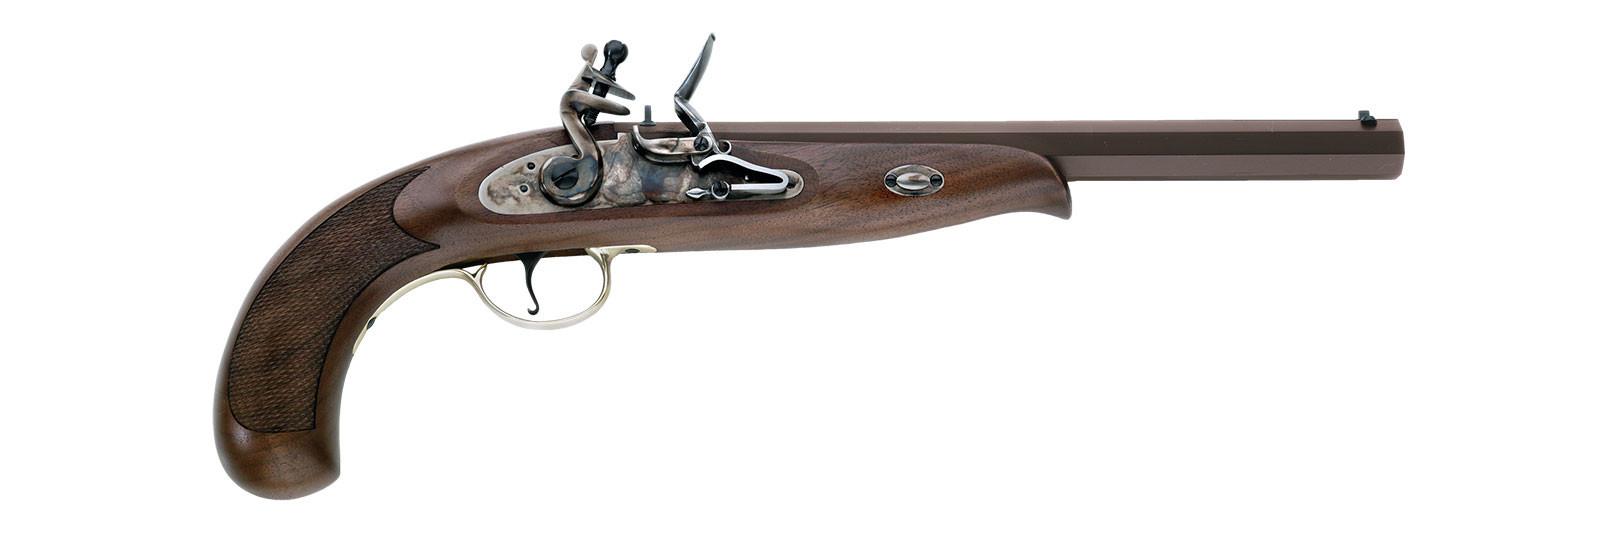 Continental Duelling Pistol flintlock model